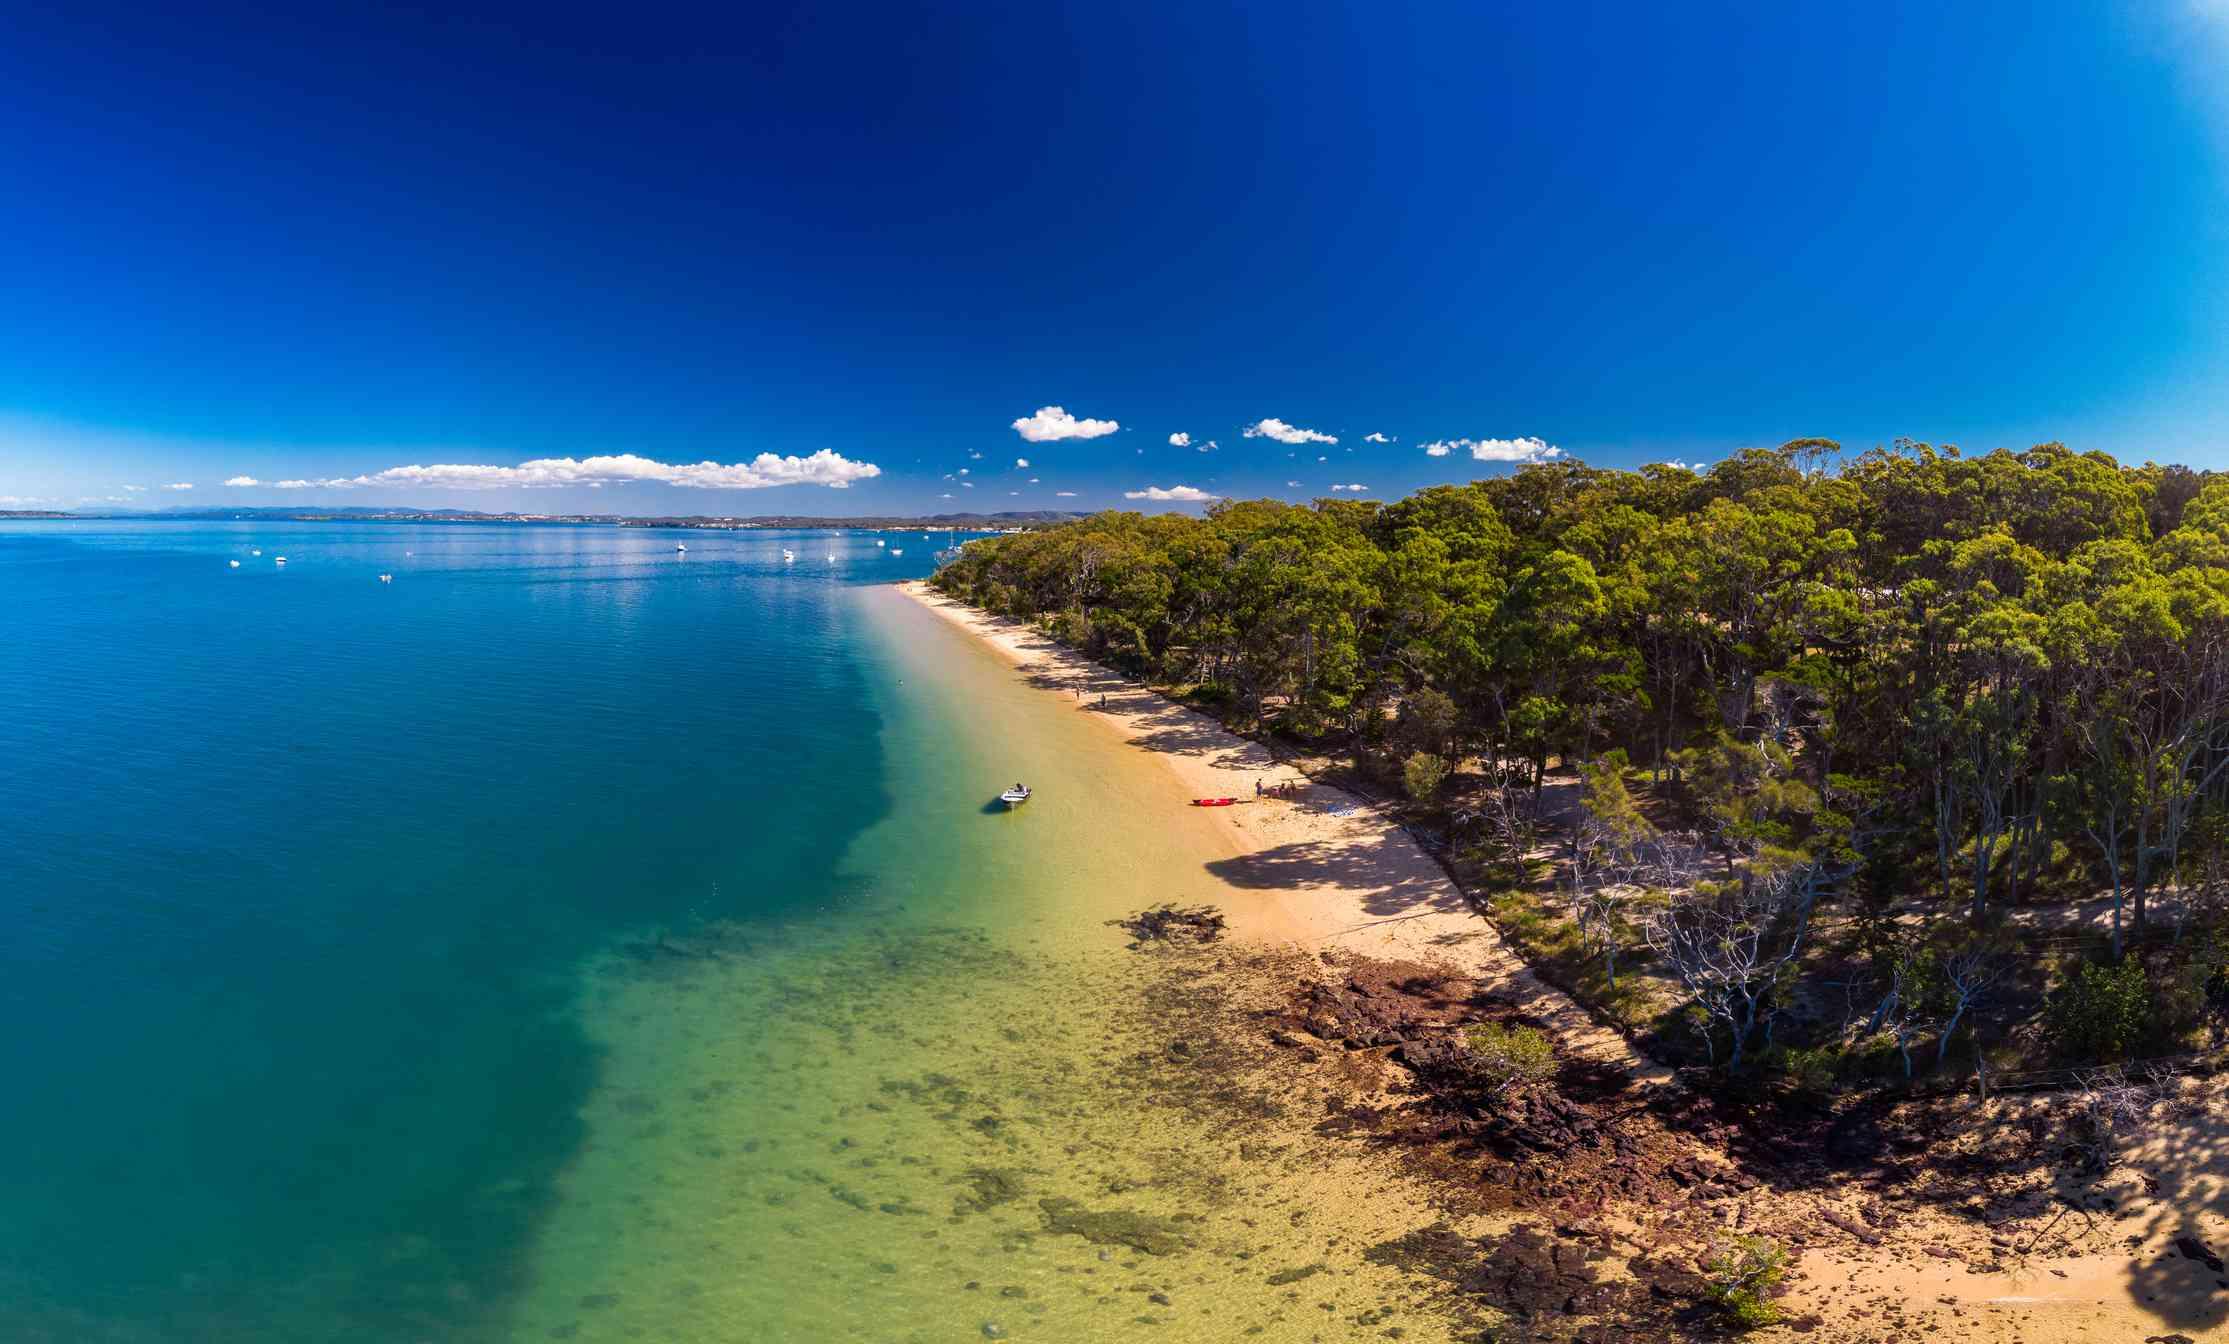 Sunny day on Coochiemudlo Island beach